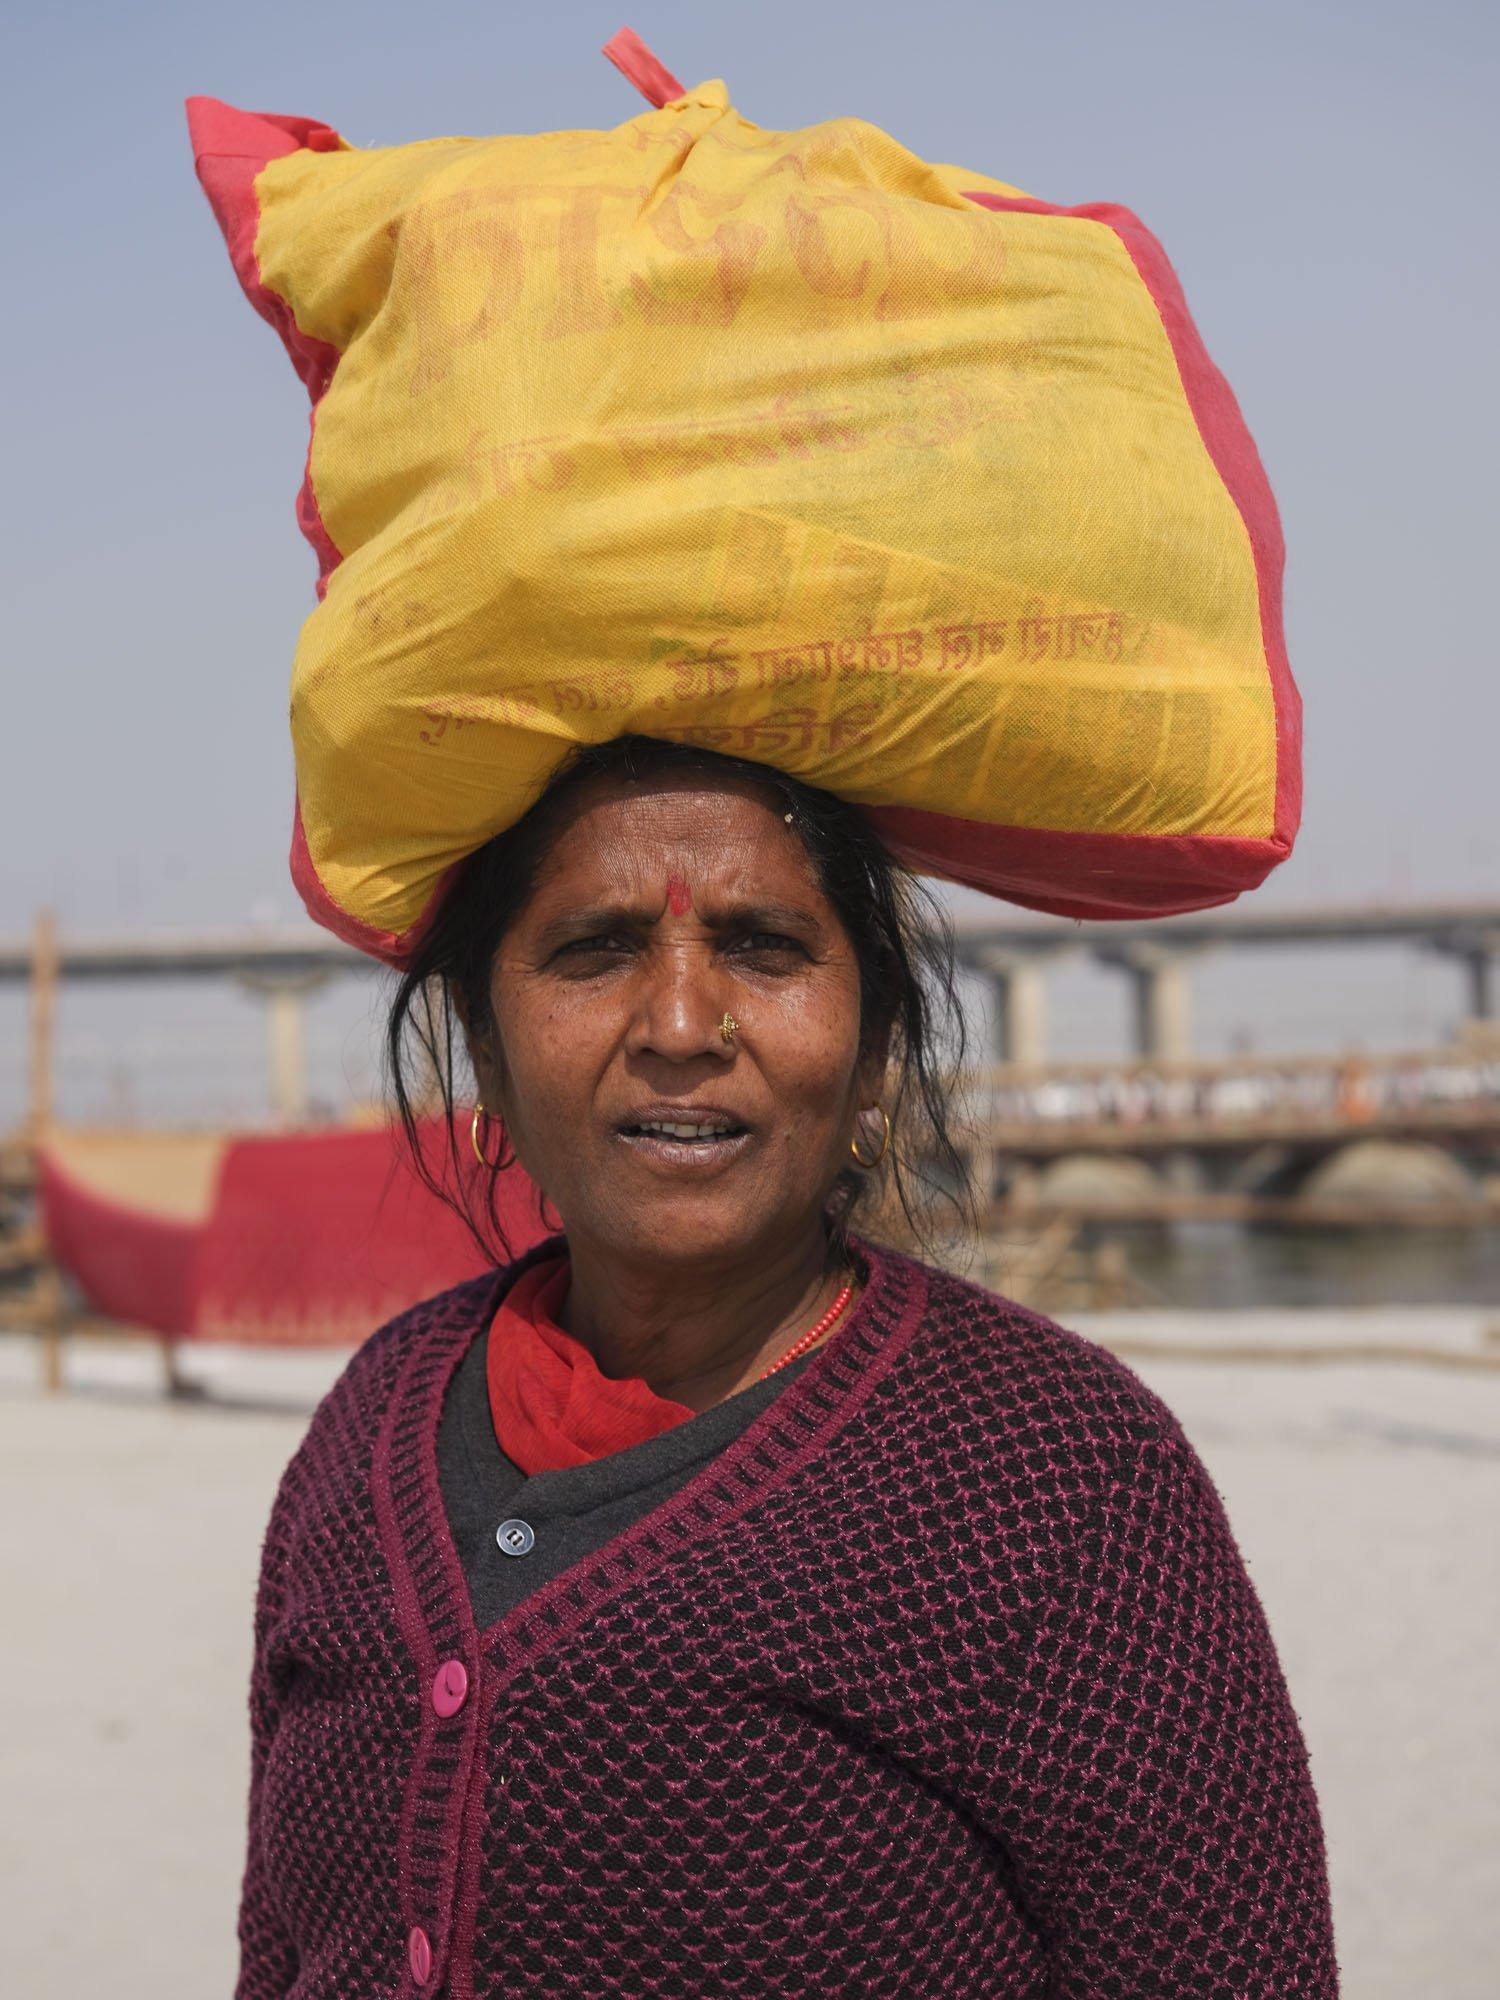 bag on the head pilgrims Kumbh mela 2019 India Allahabad Prayagraj Ardh hindu religious Festival event rivers photographer jose jeuland photography